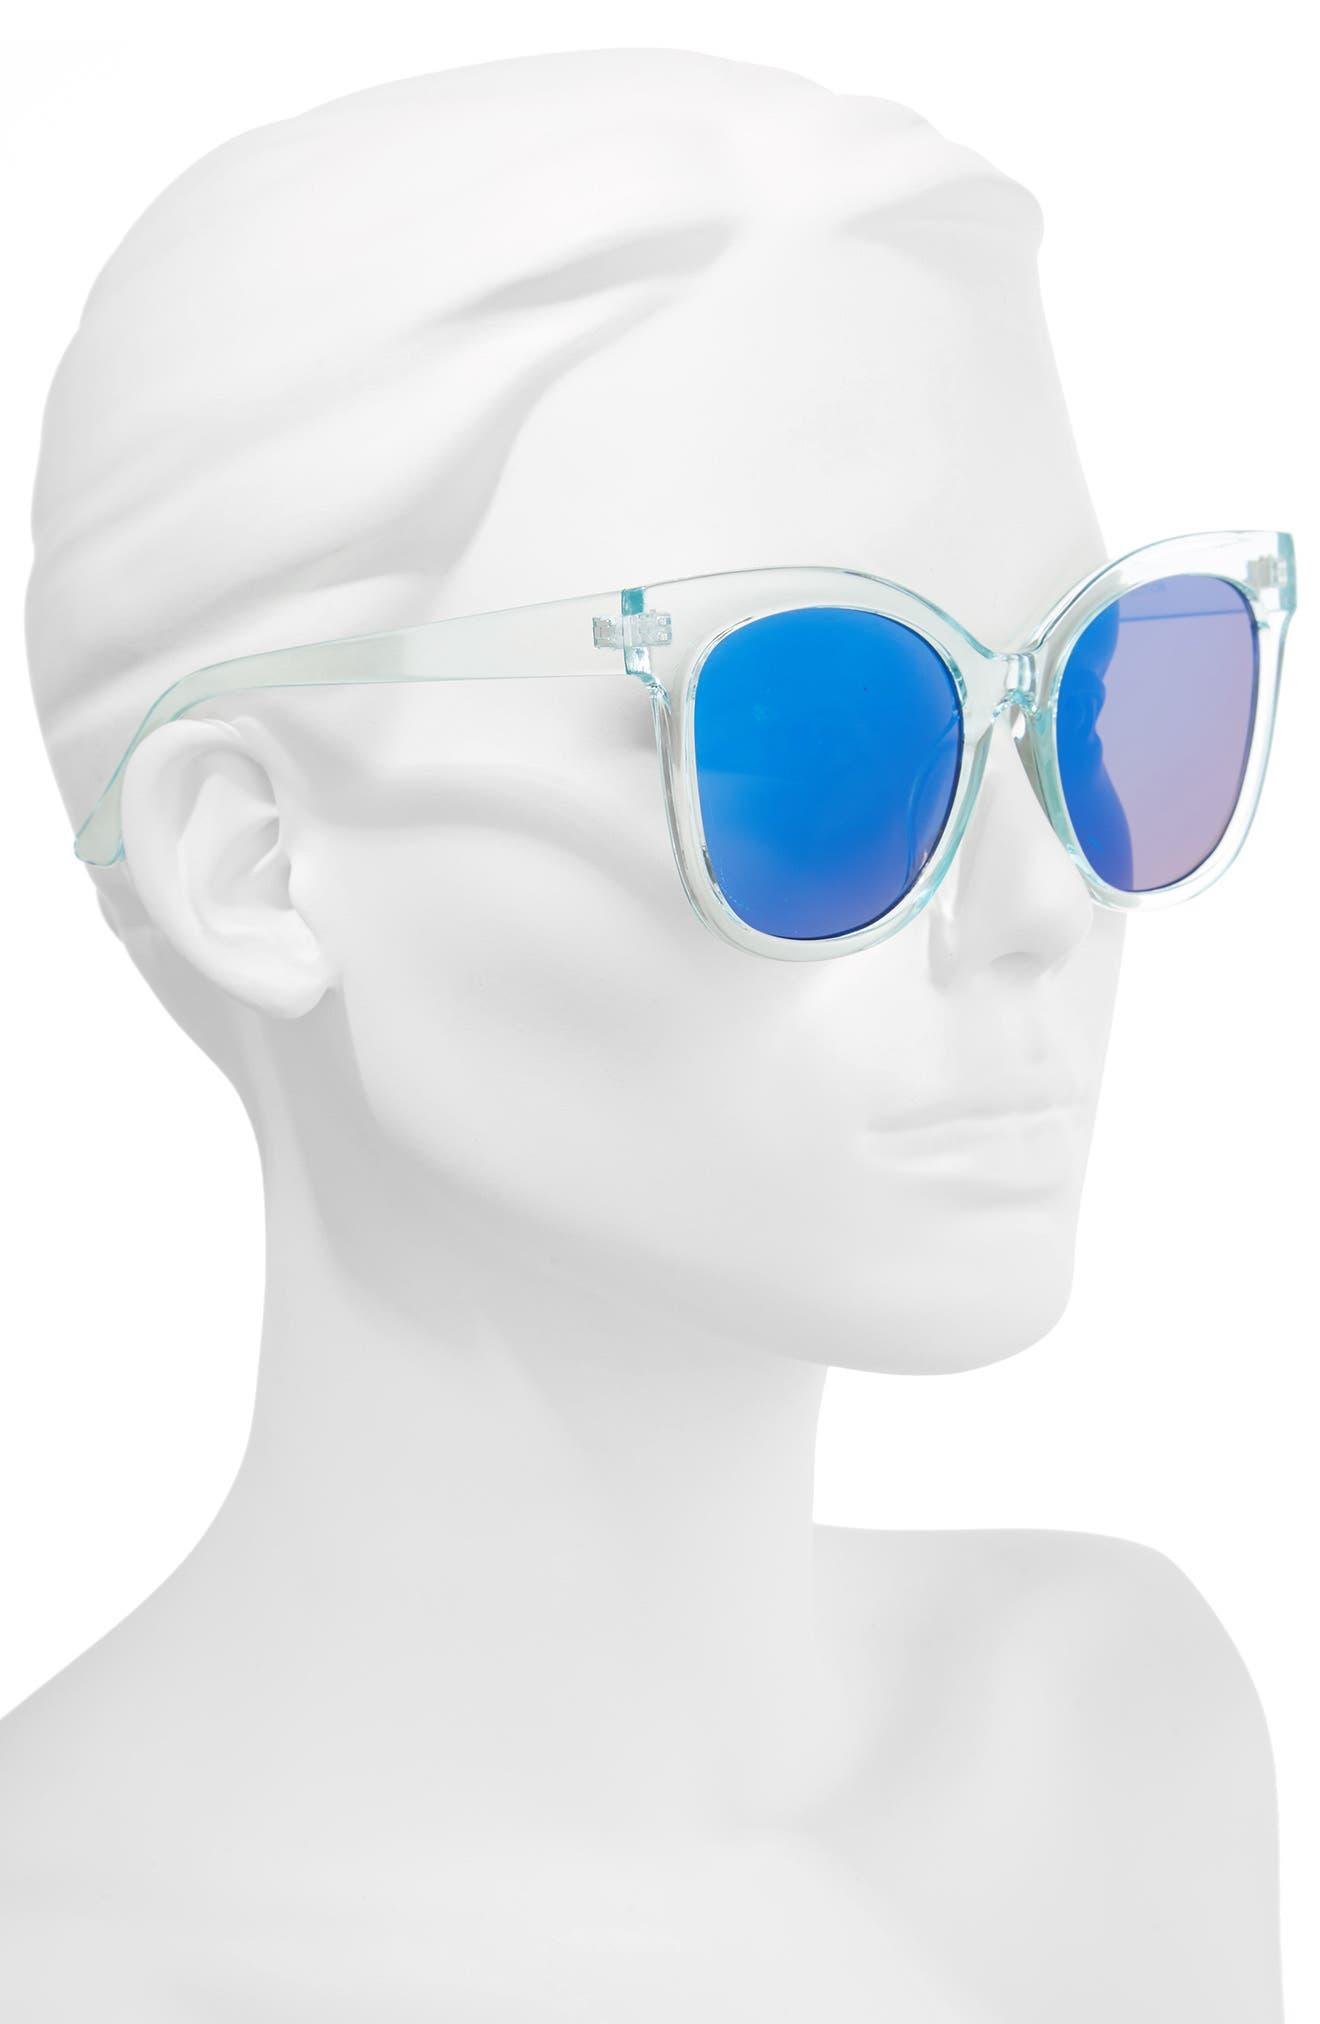 57mm Cat Eye Sunglasses,                             Alternate thumbnail 2, color,                             300